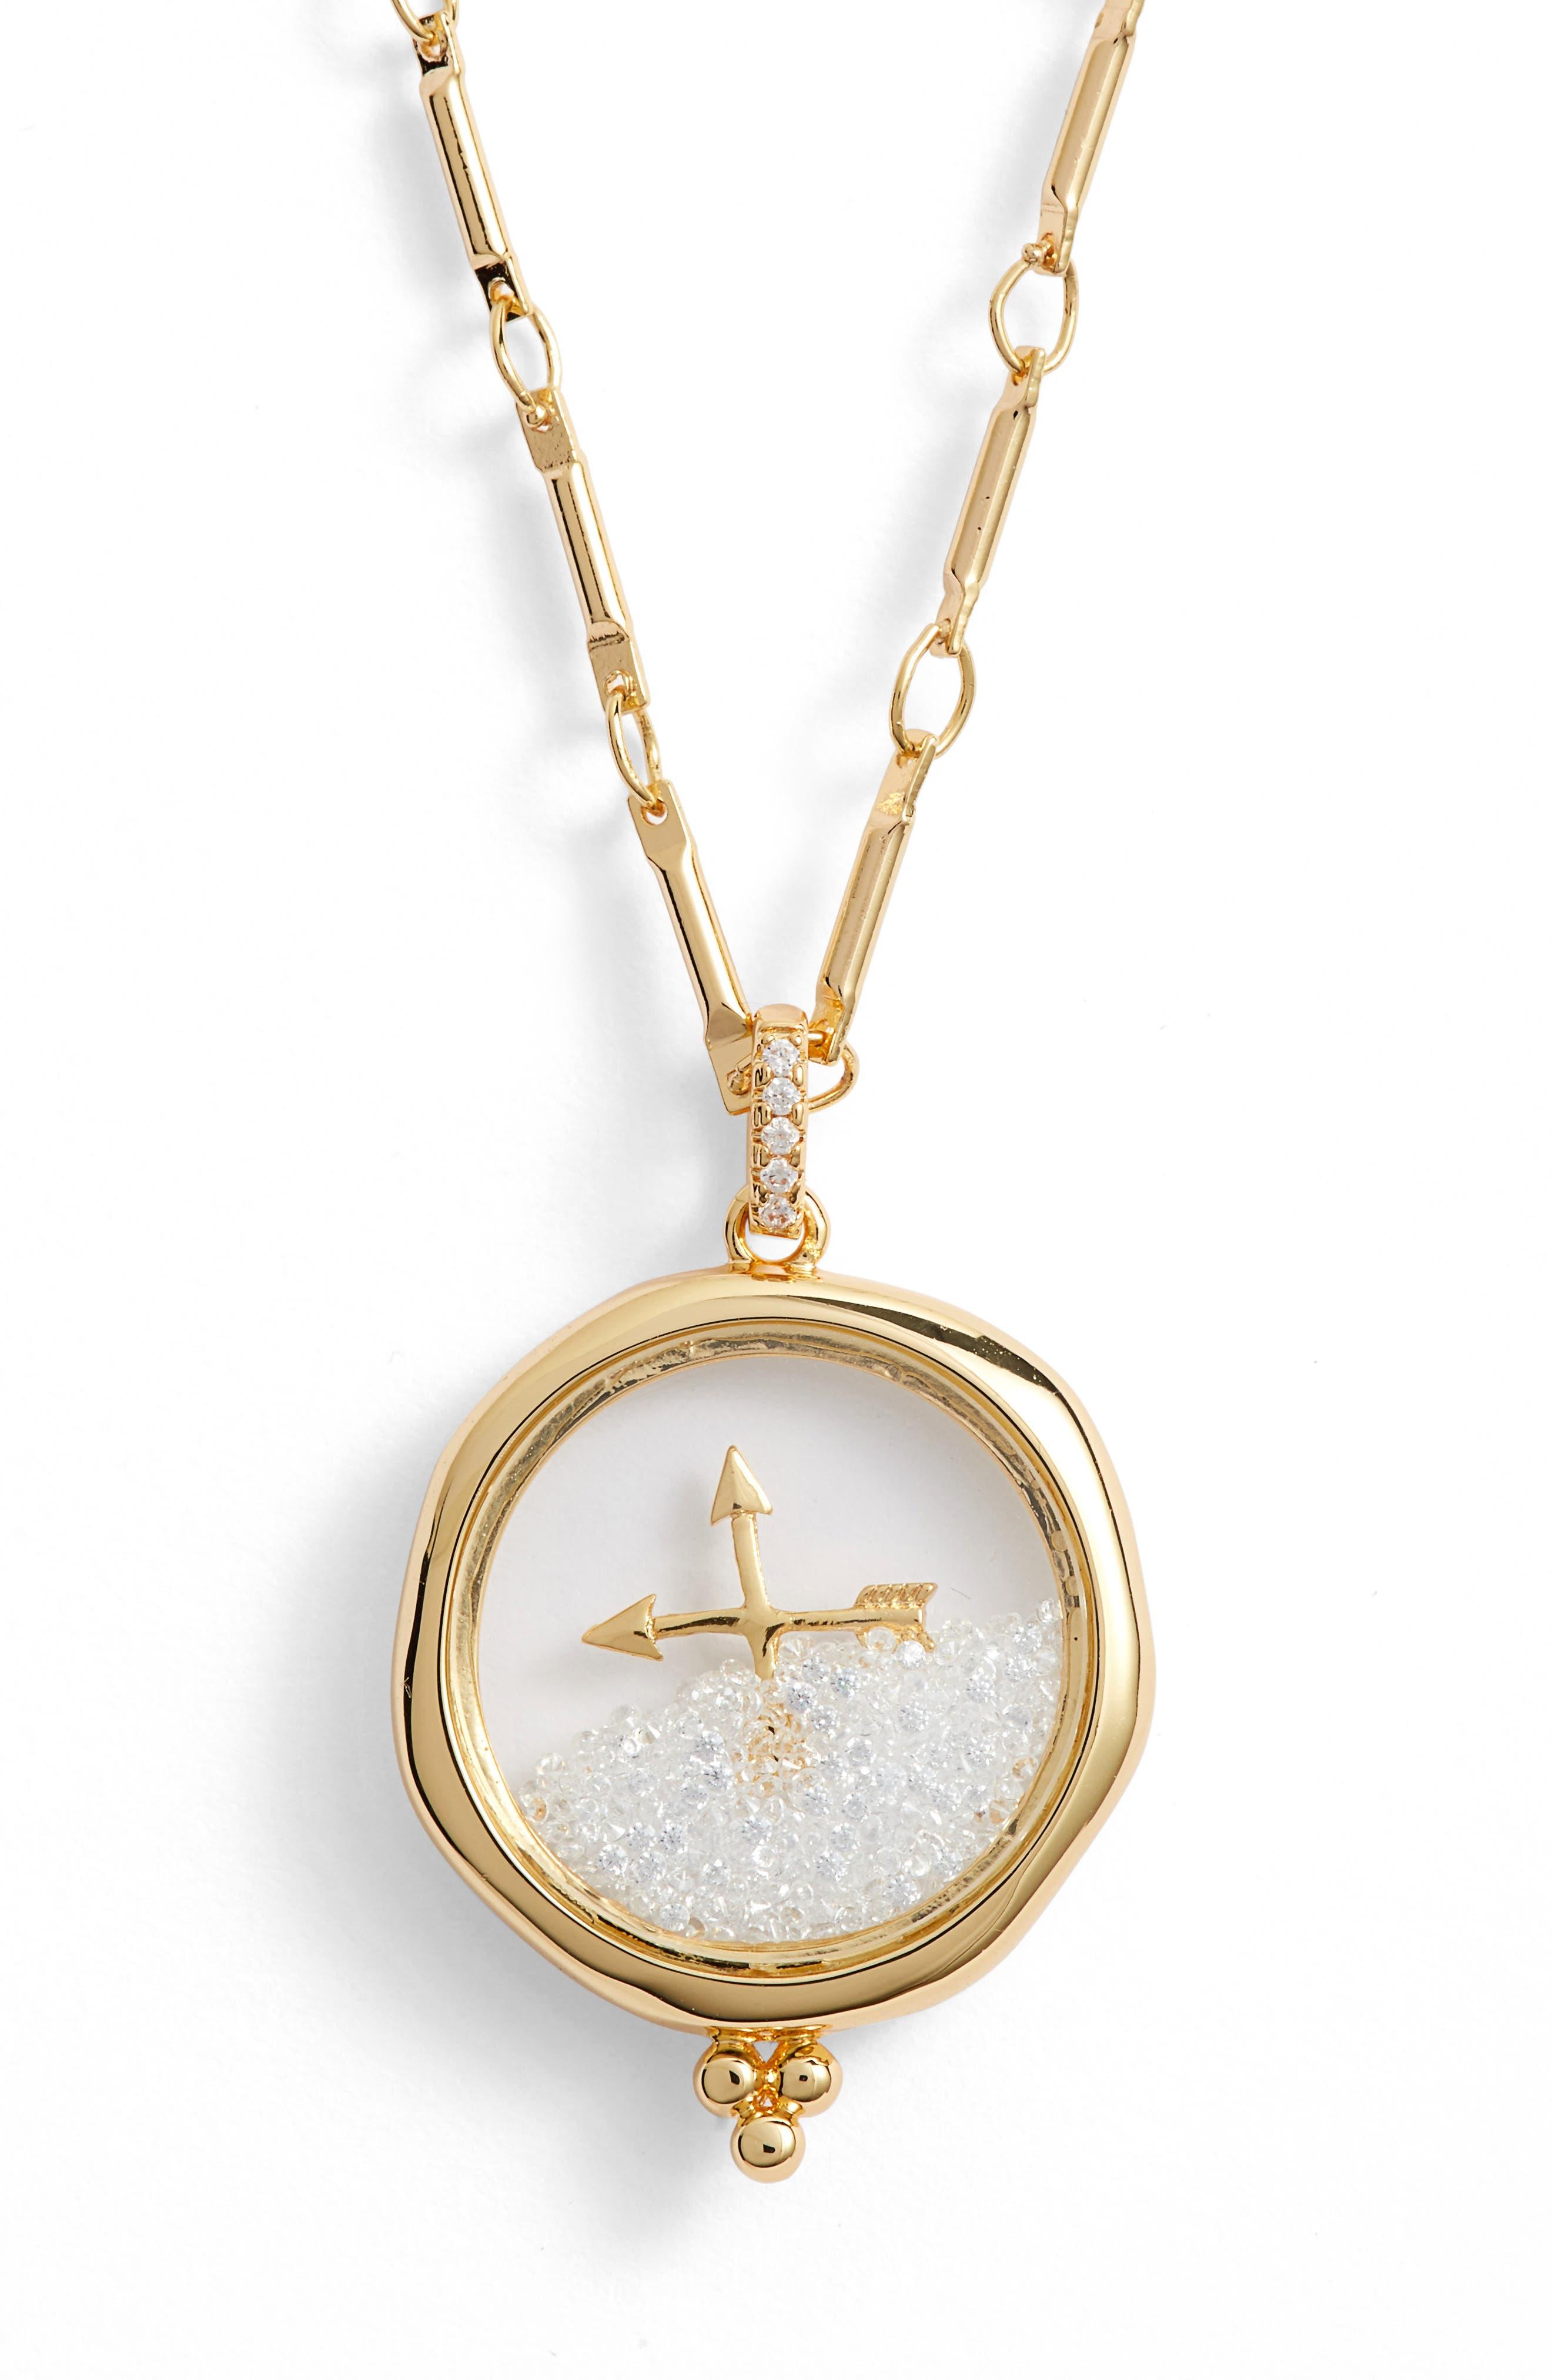 LULU DK X Kristina Schulman Friendship Shaker Pendant Necklace in Gold